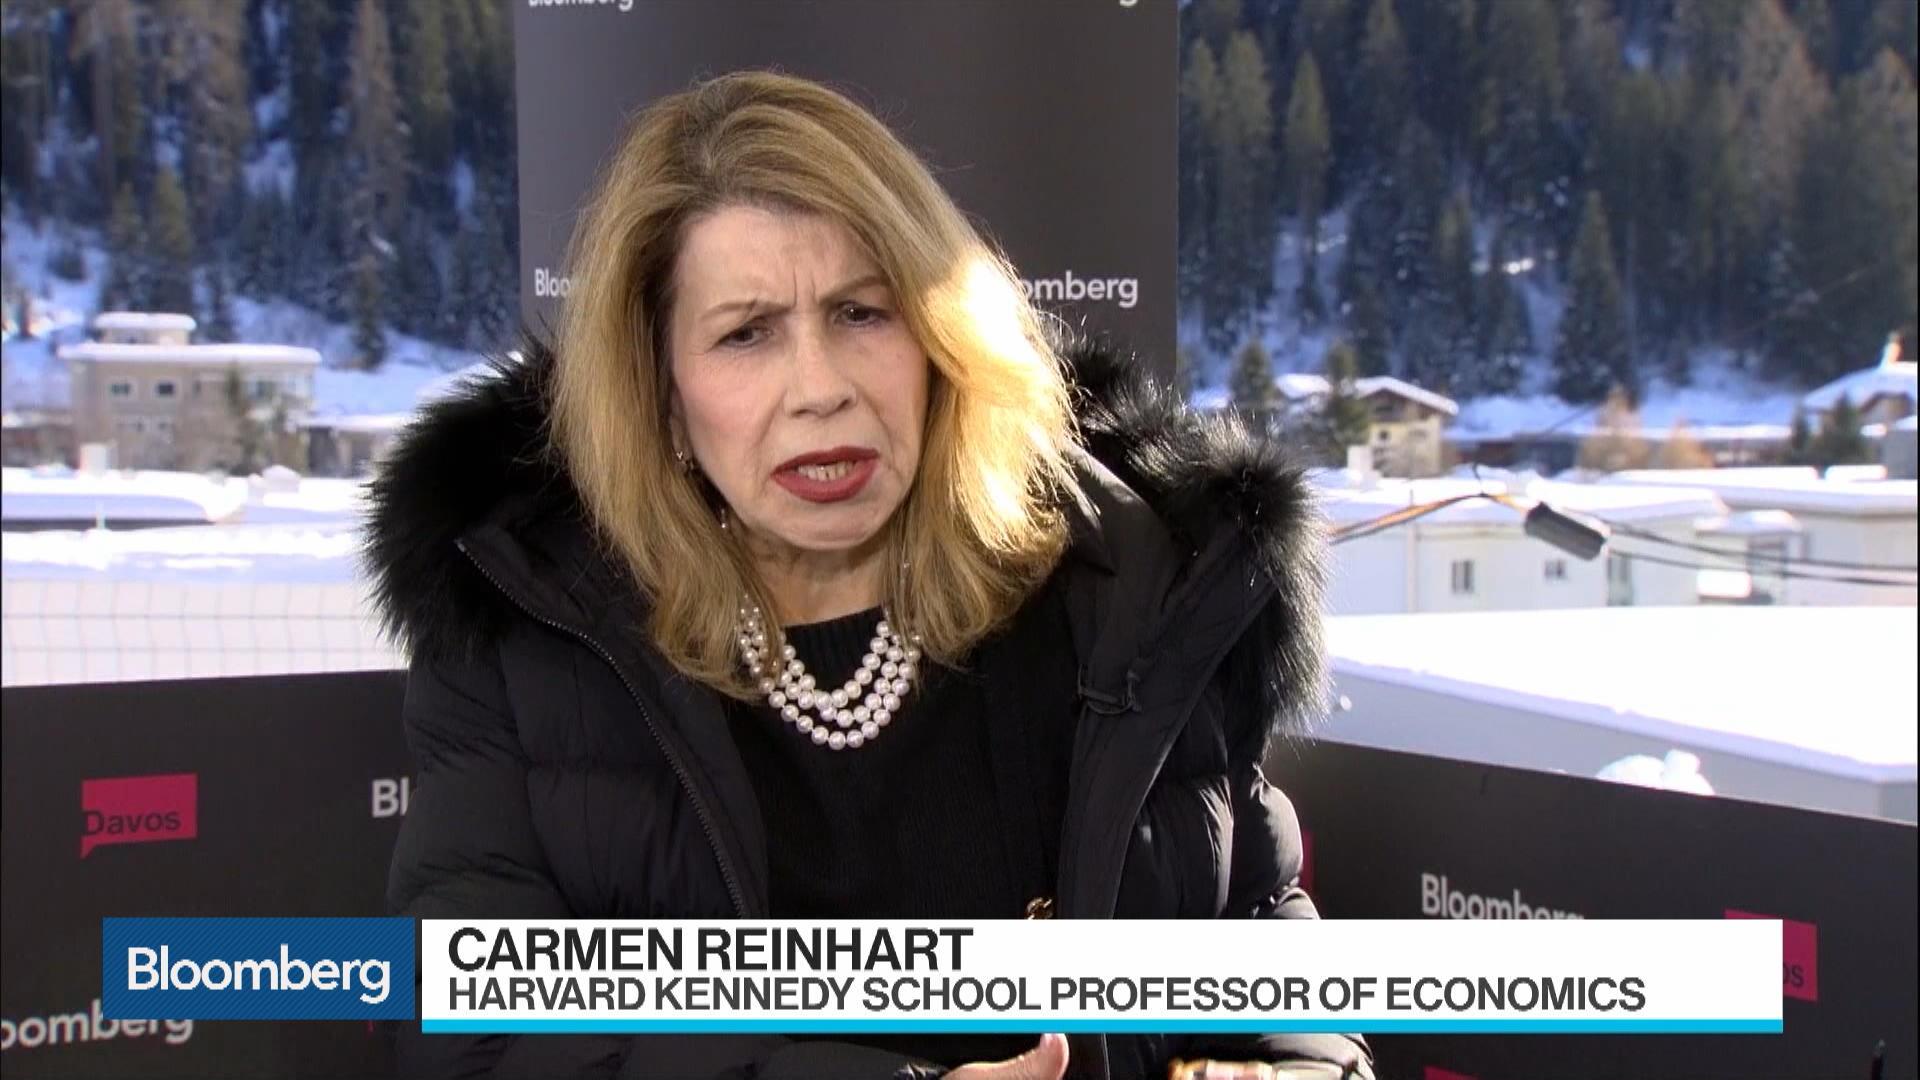 Harvard Kennedy School Professor Carmen Reinhart